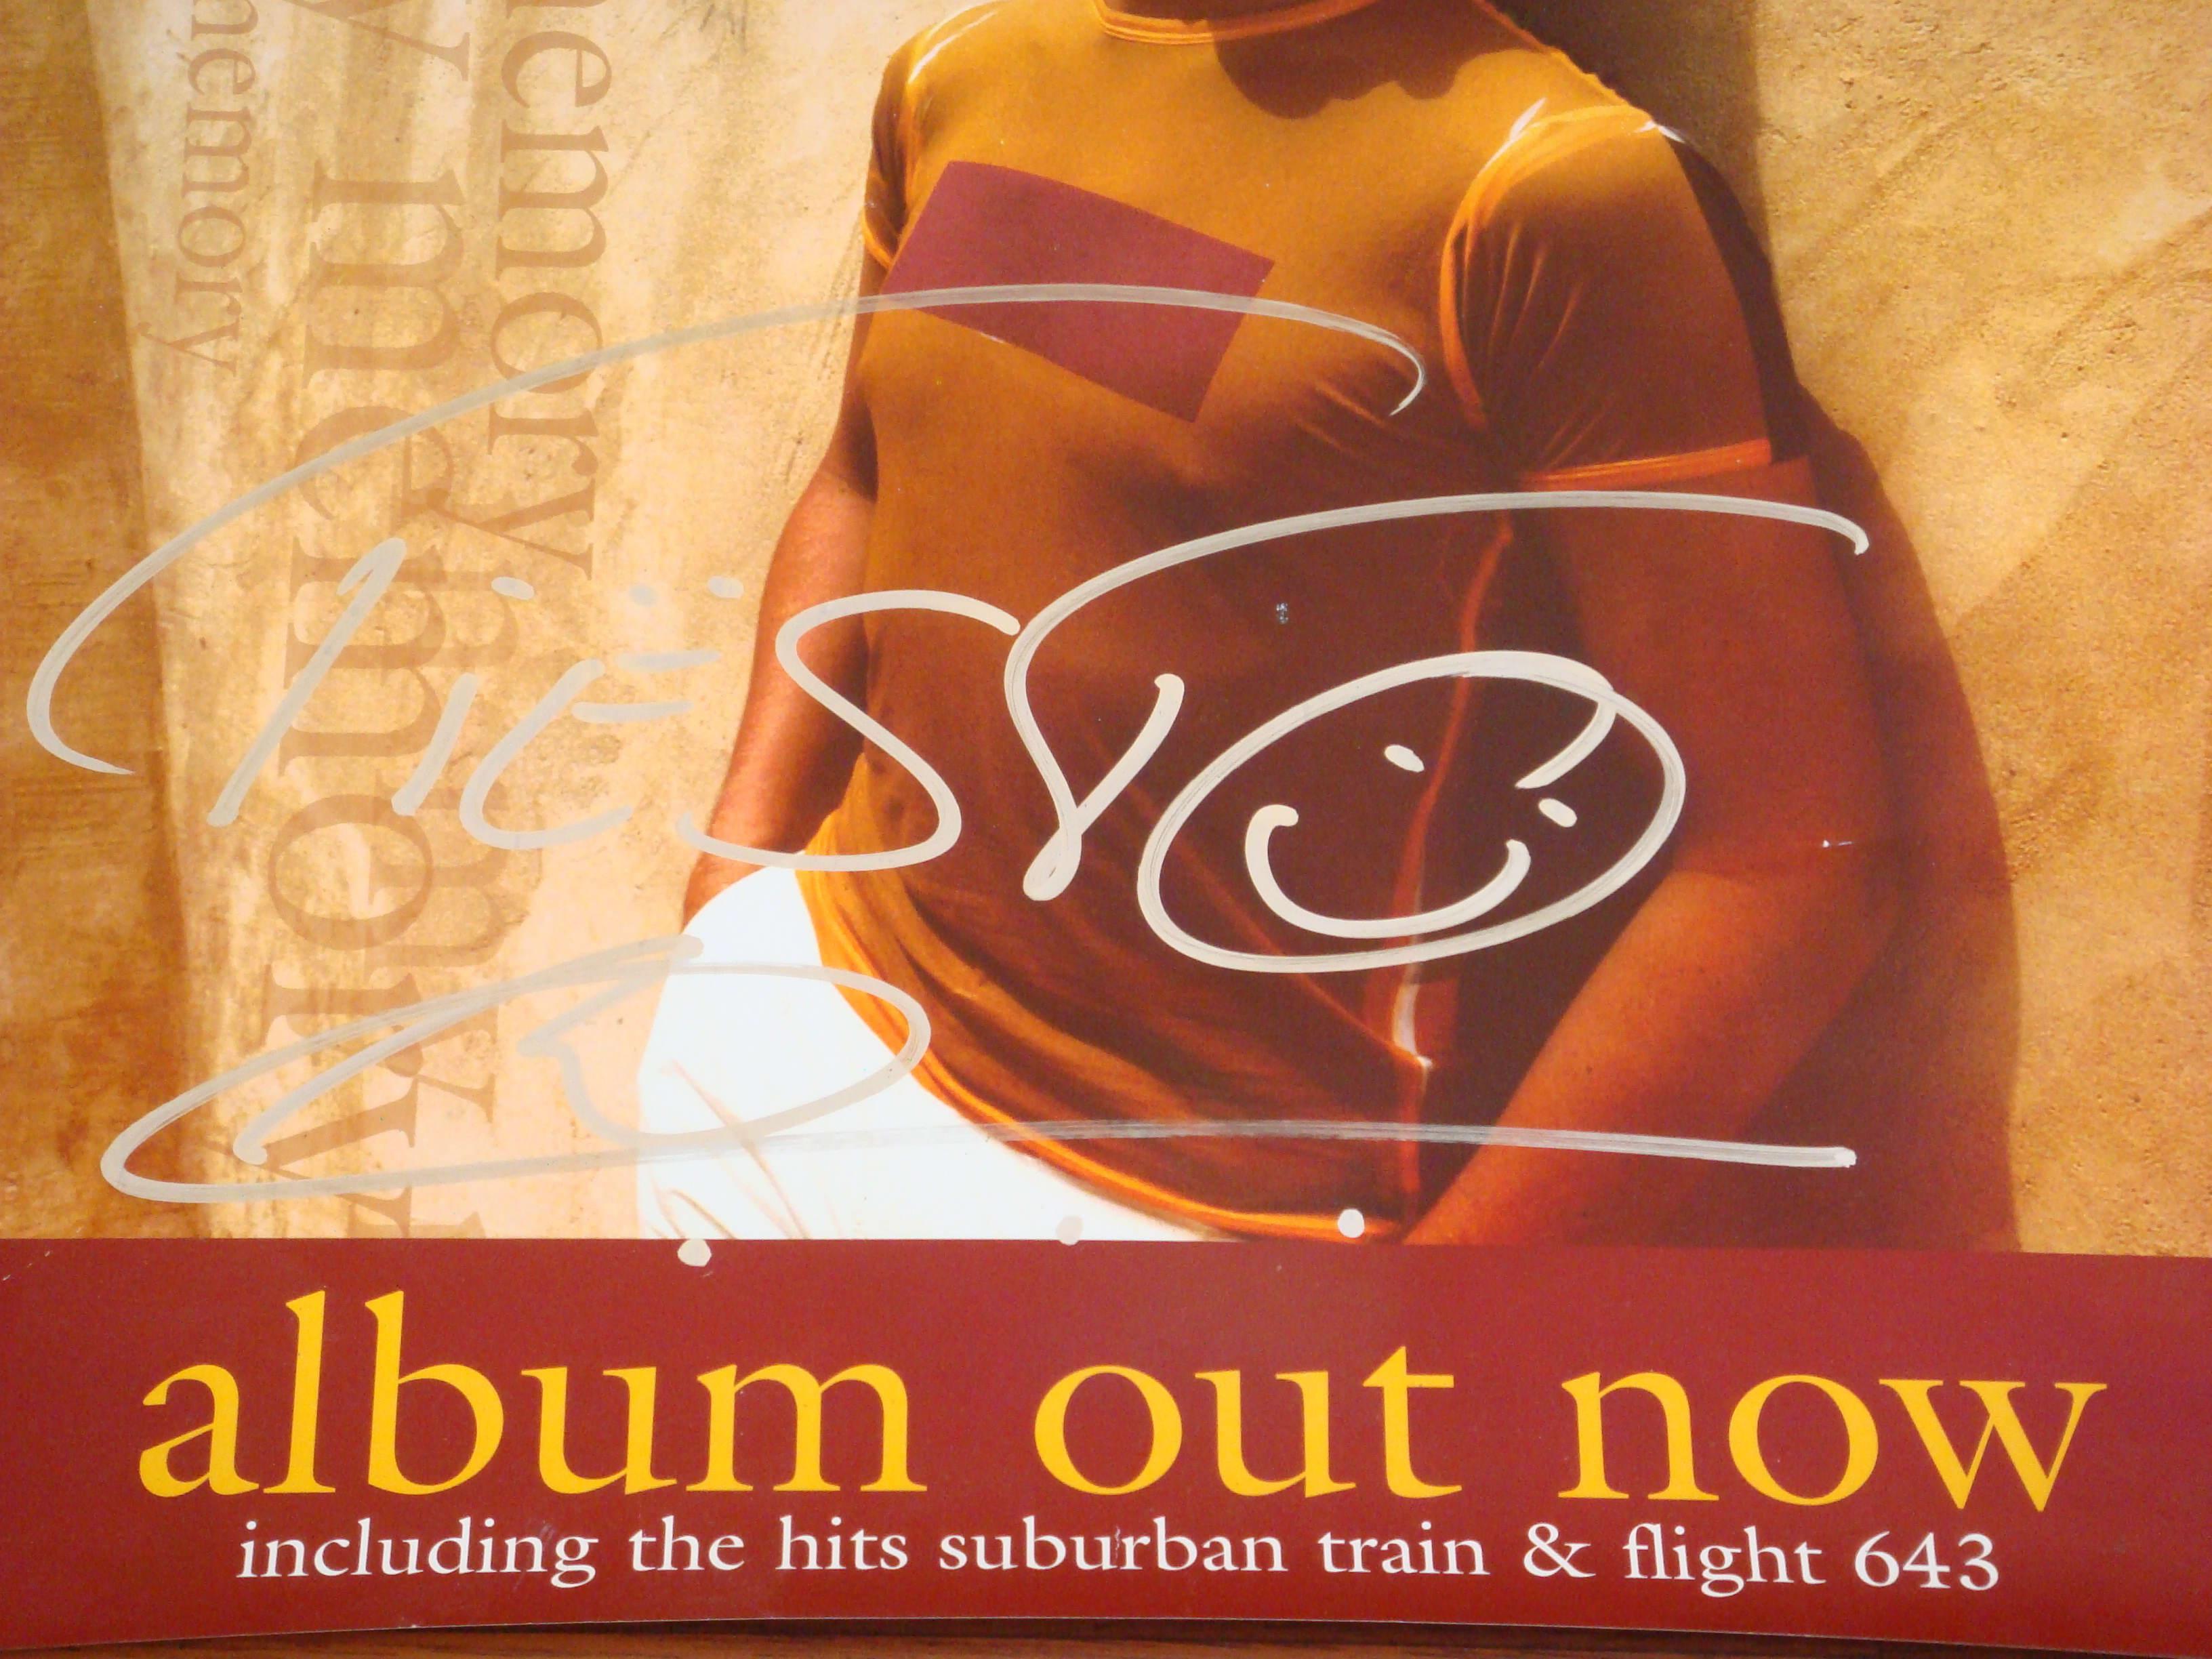 Dj Tiesto In My Memory Release Poster